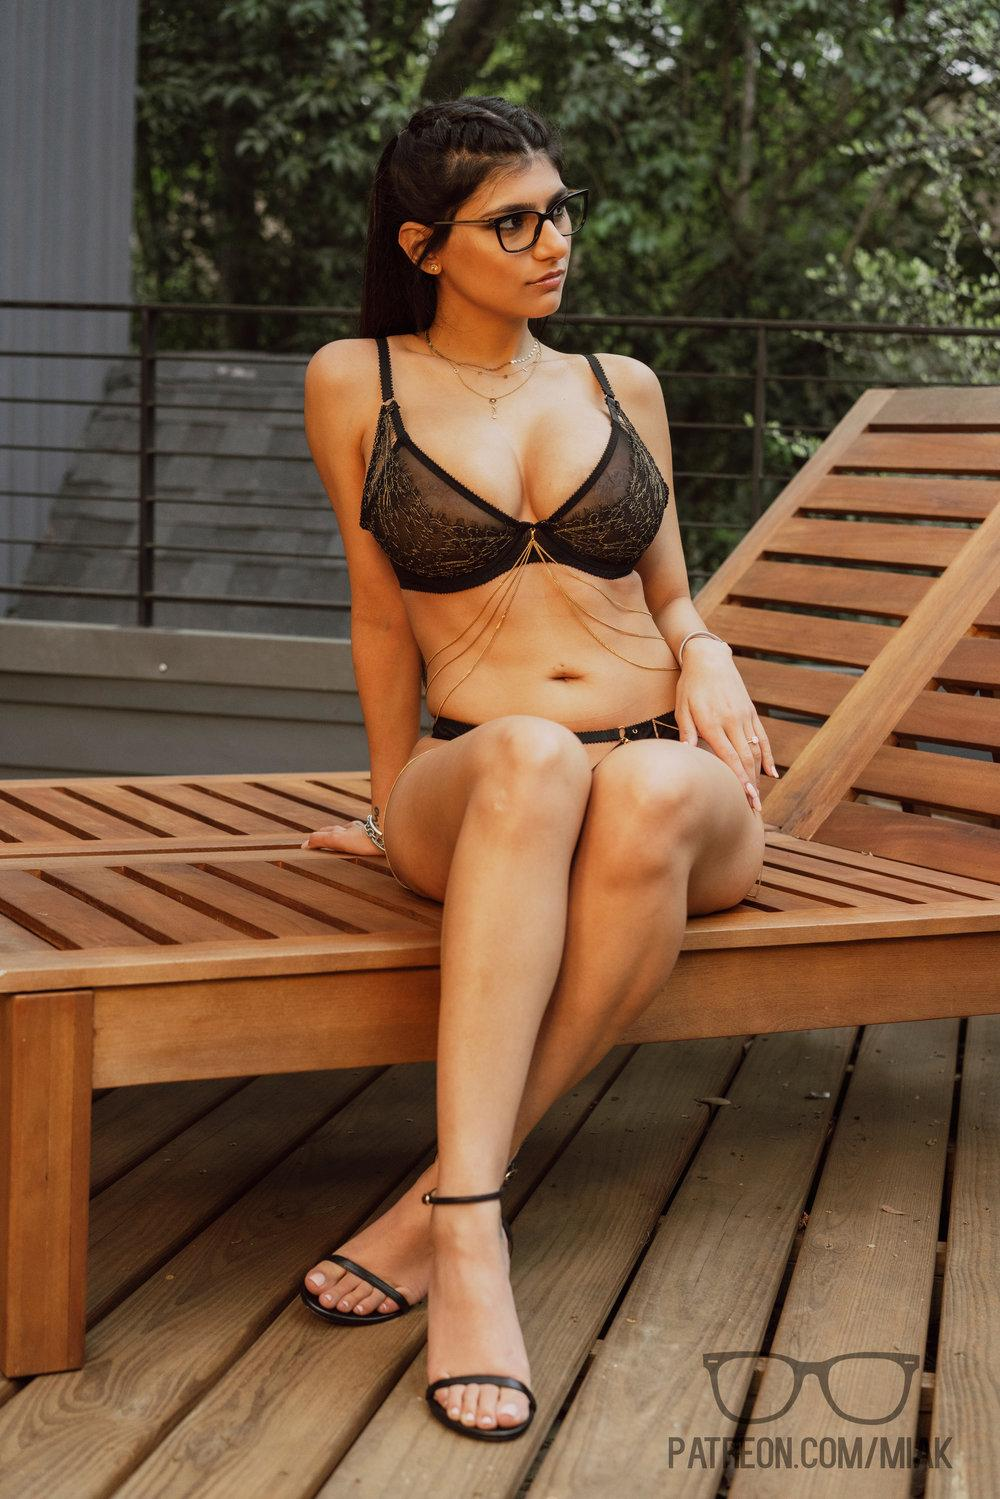 Mia Khalifa Outdoor Lingerie Patreon Set Leaked Mtitnv